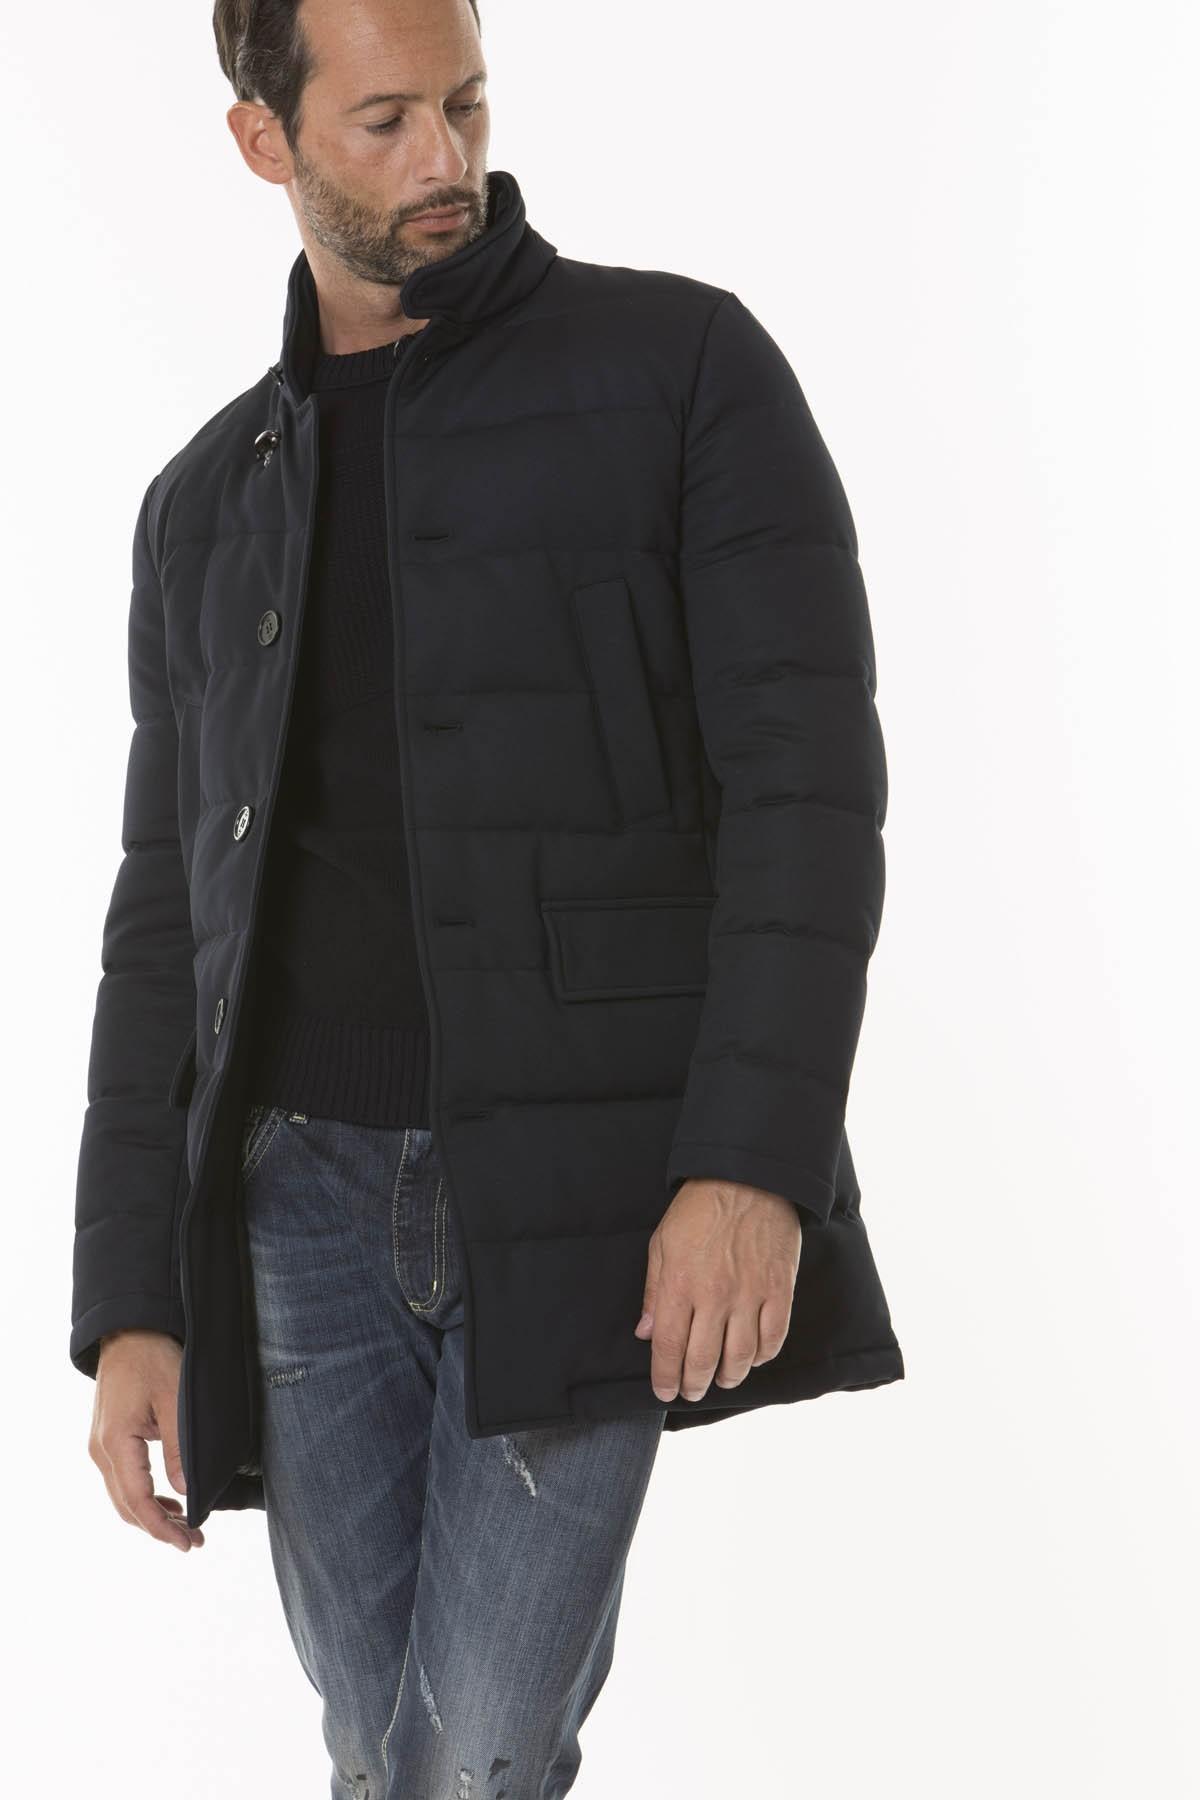 buy popular 9c1e7 f5529 Giaccone per uomo FAY A/I 18-19